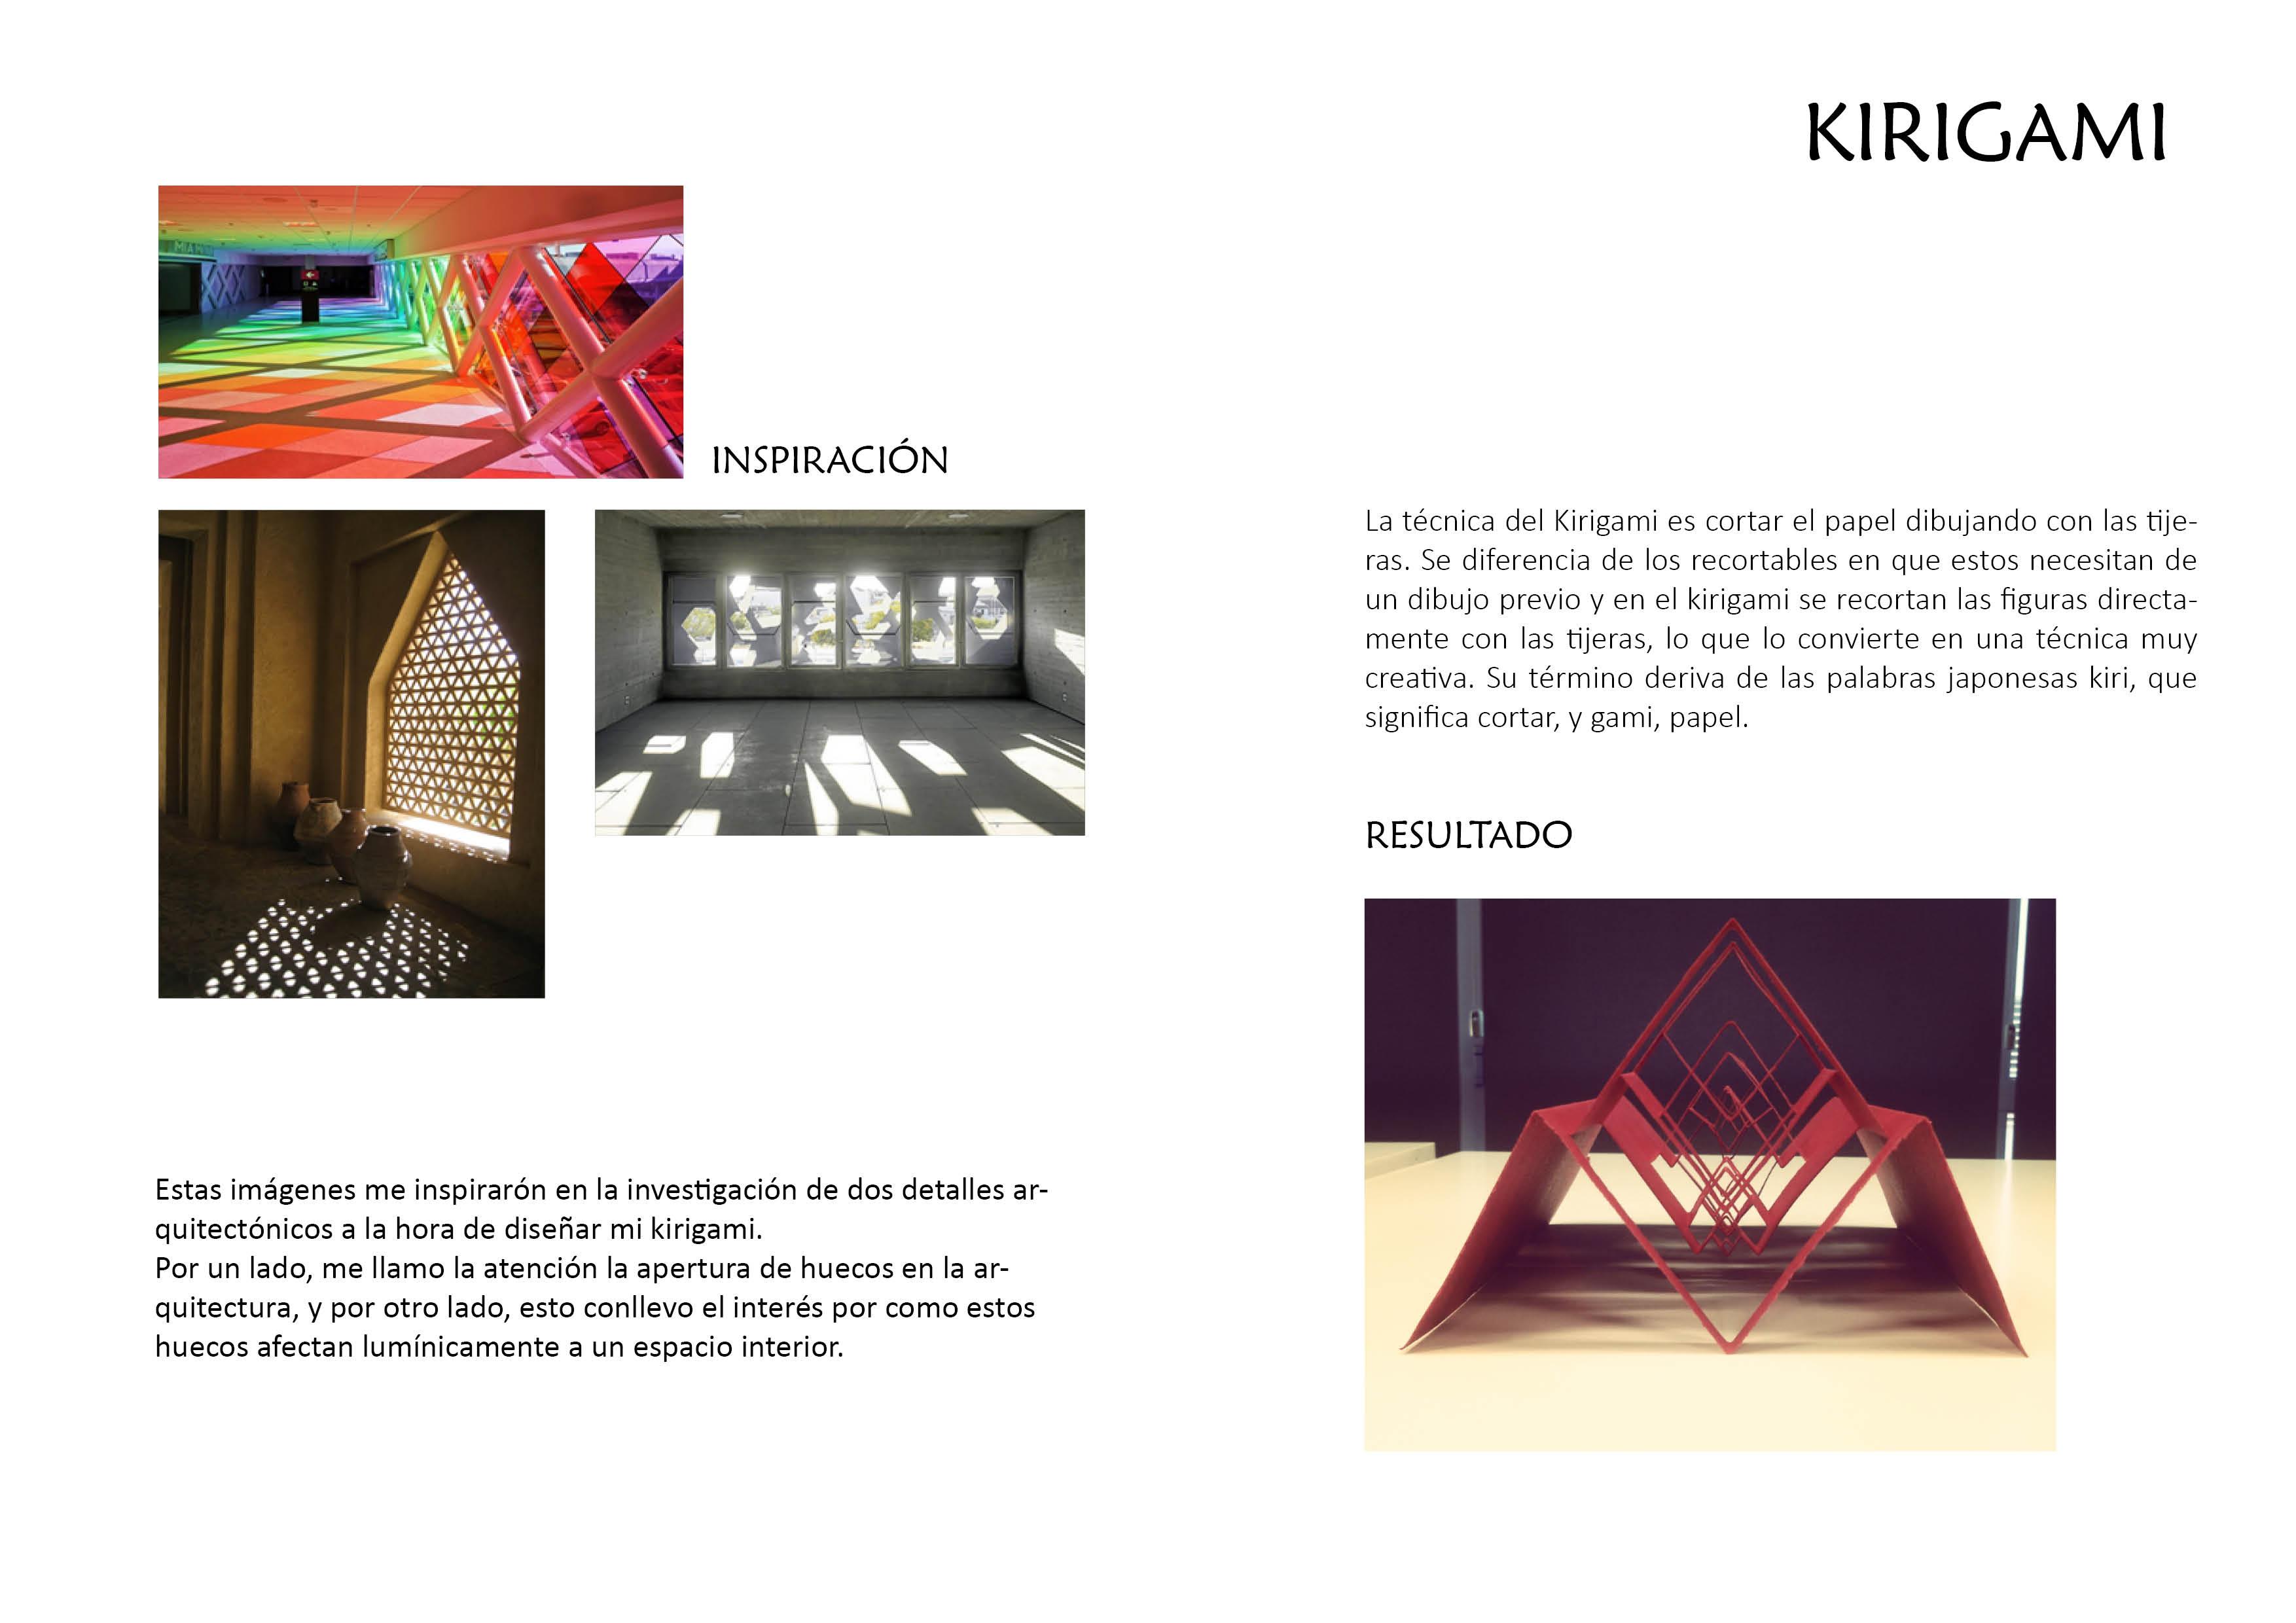 Escuela superior de dise o de arag n proyecto kirigami for Escuela superior de diseno